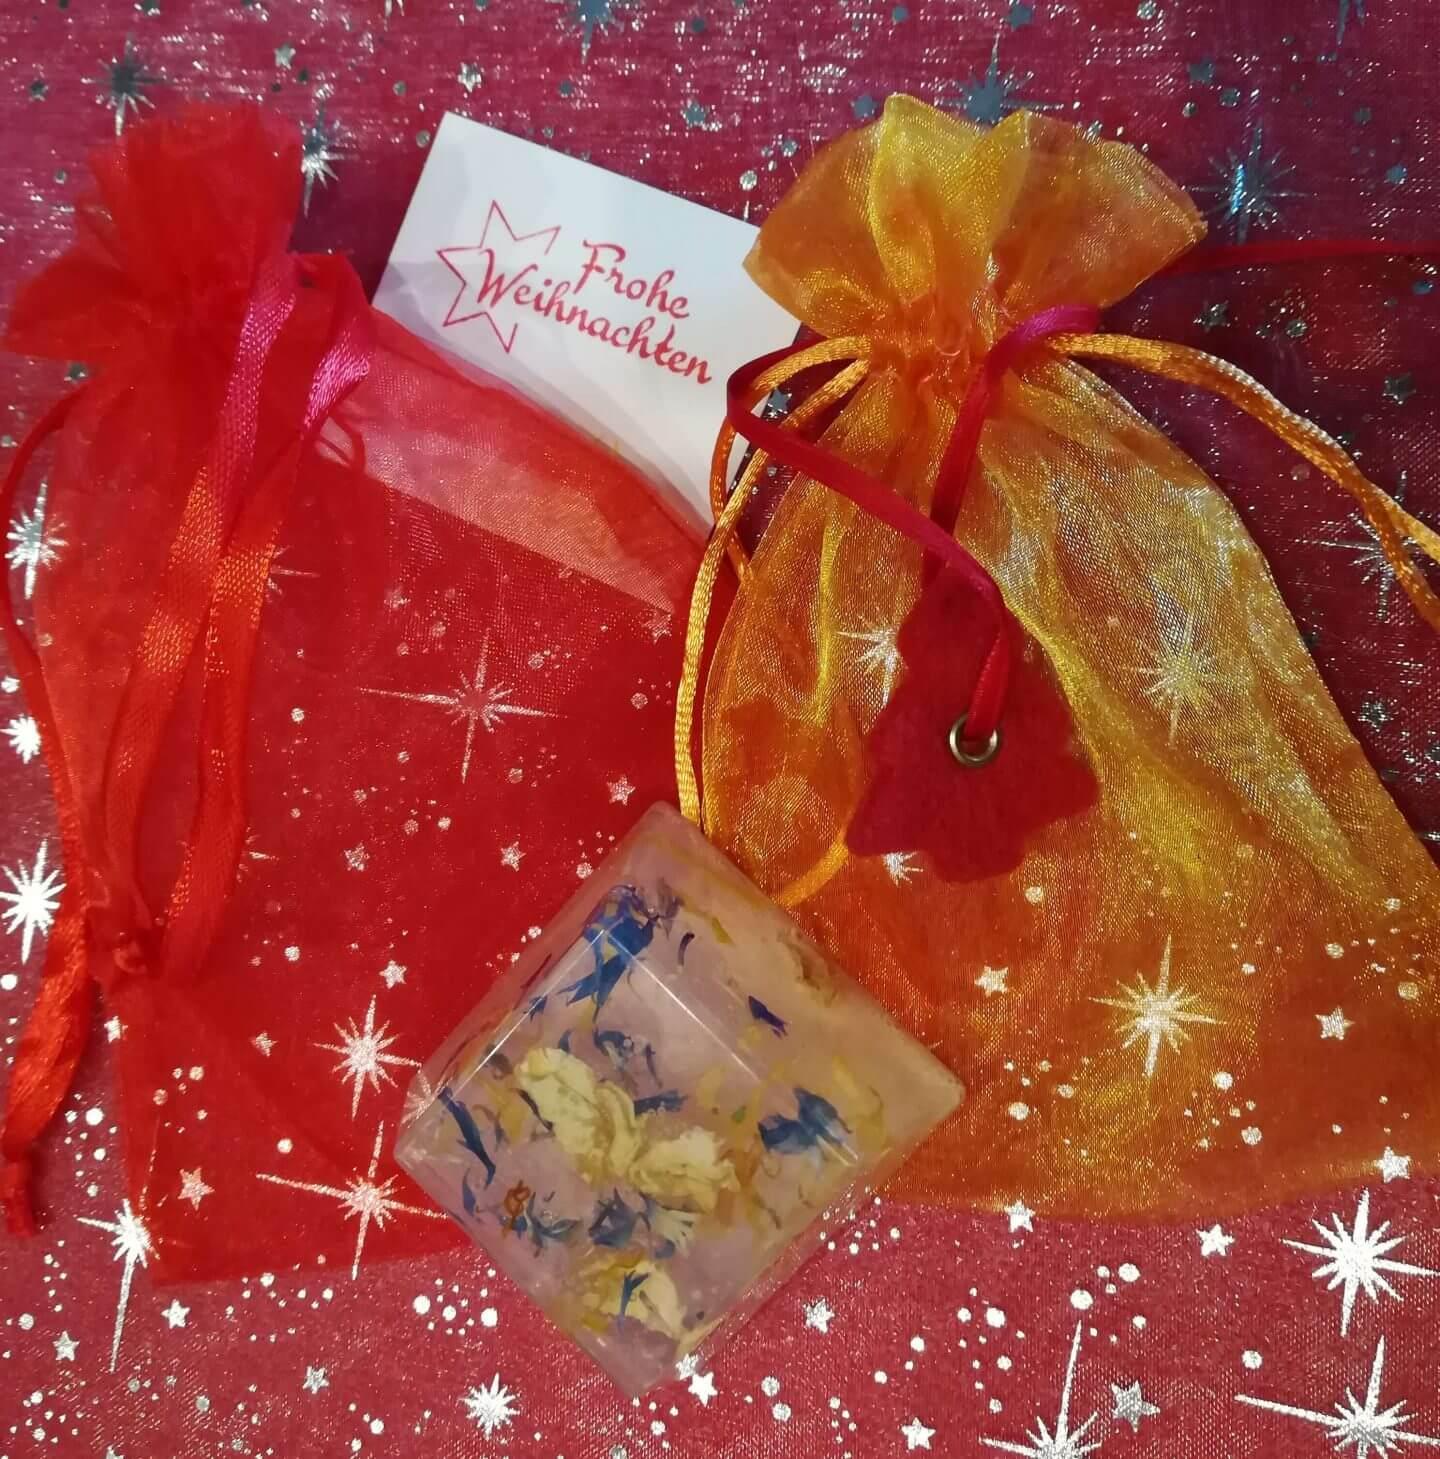 Blüten-Seife und Verpackungsmaterial